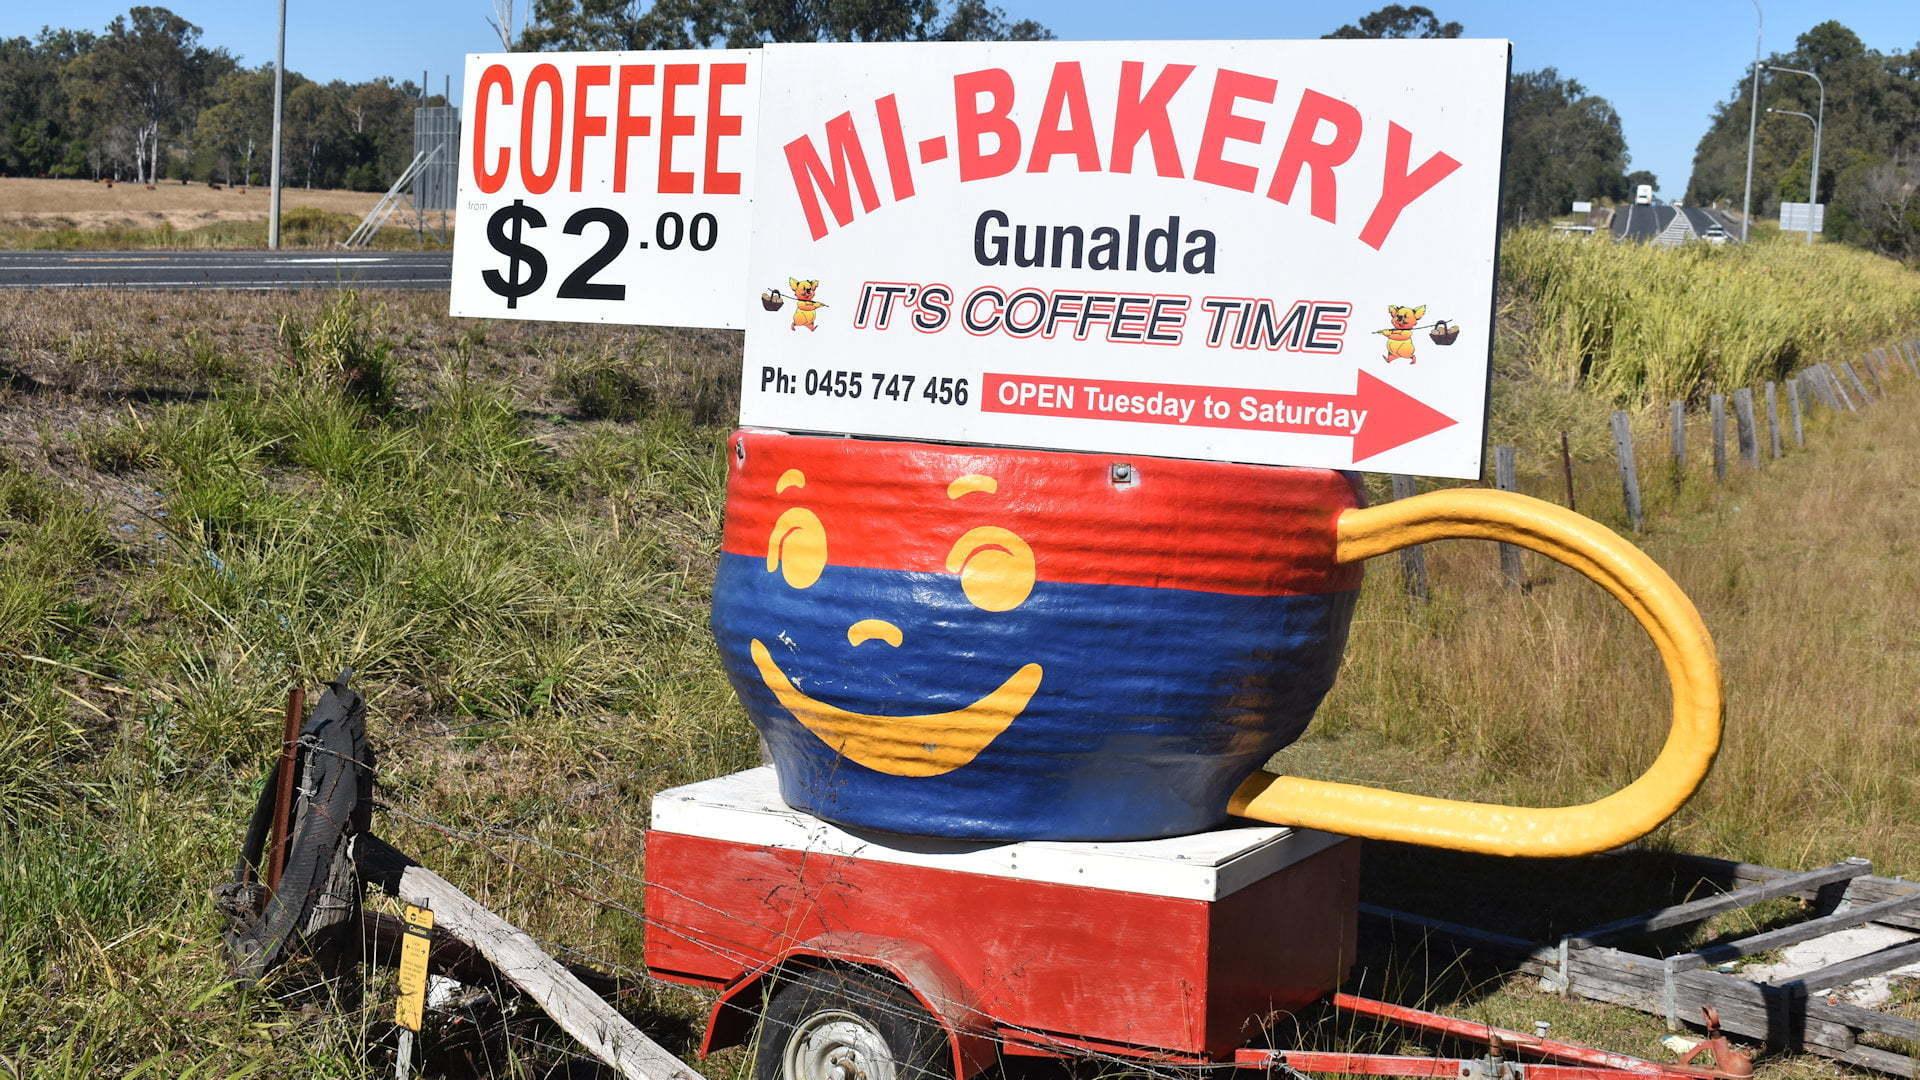 Big Cup Gunalda